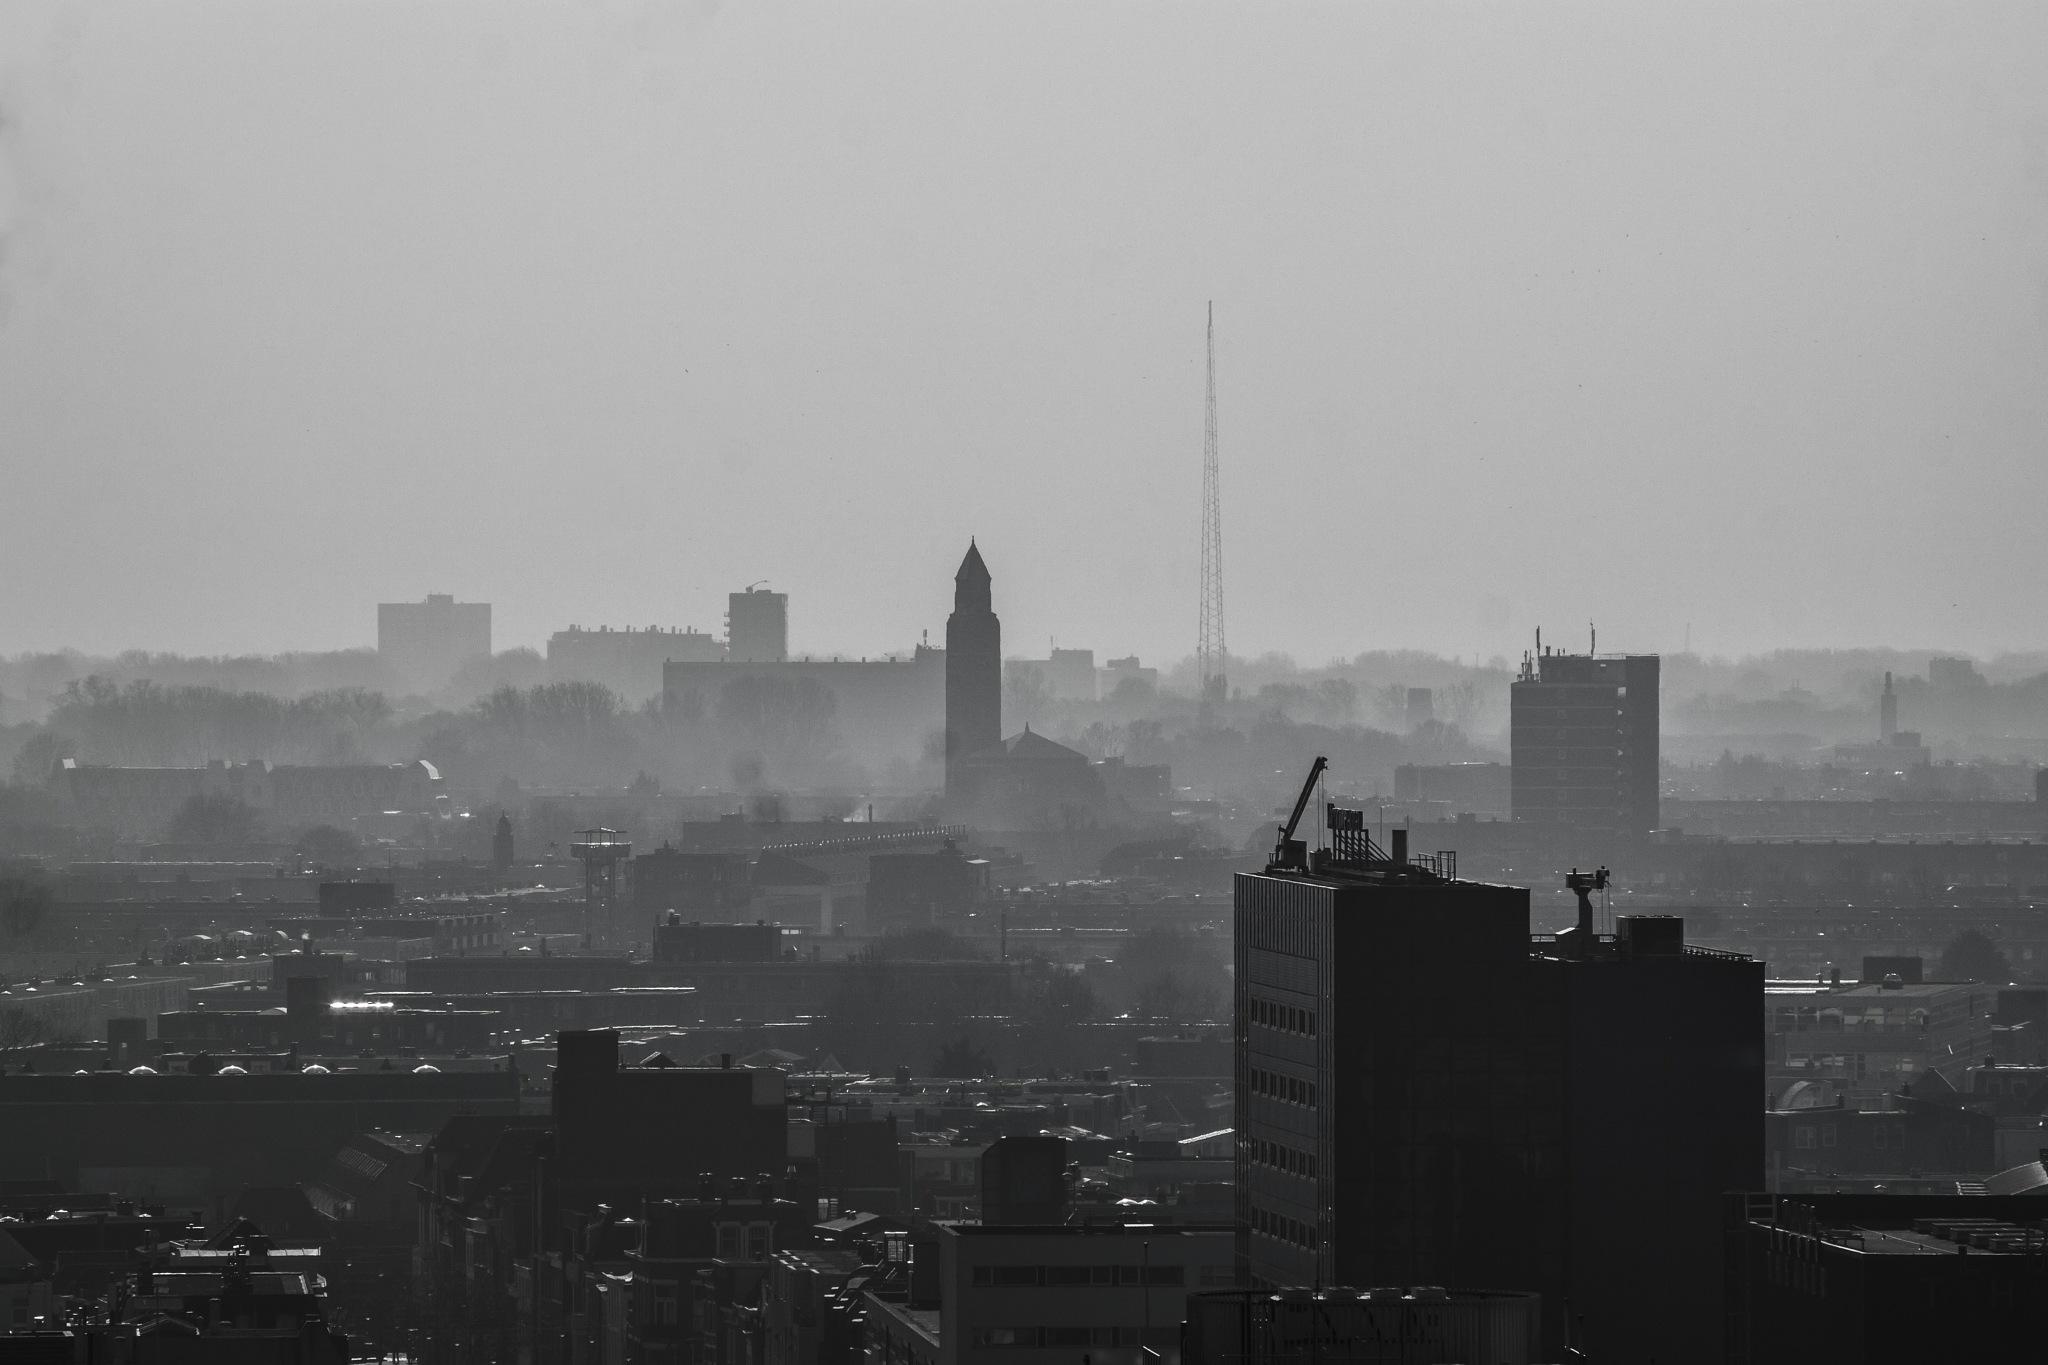 Foggy day by DavidZisky